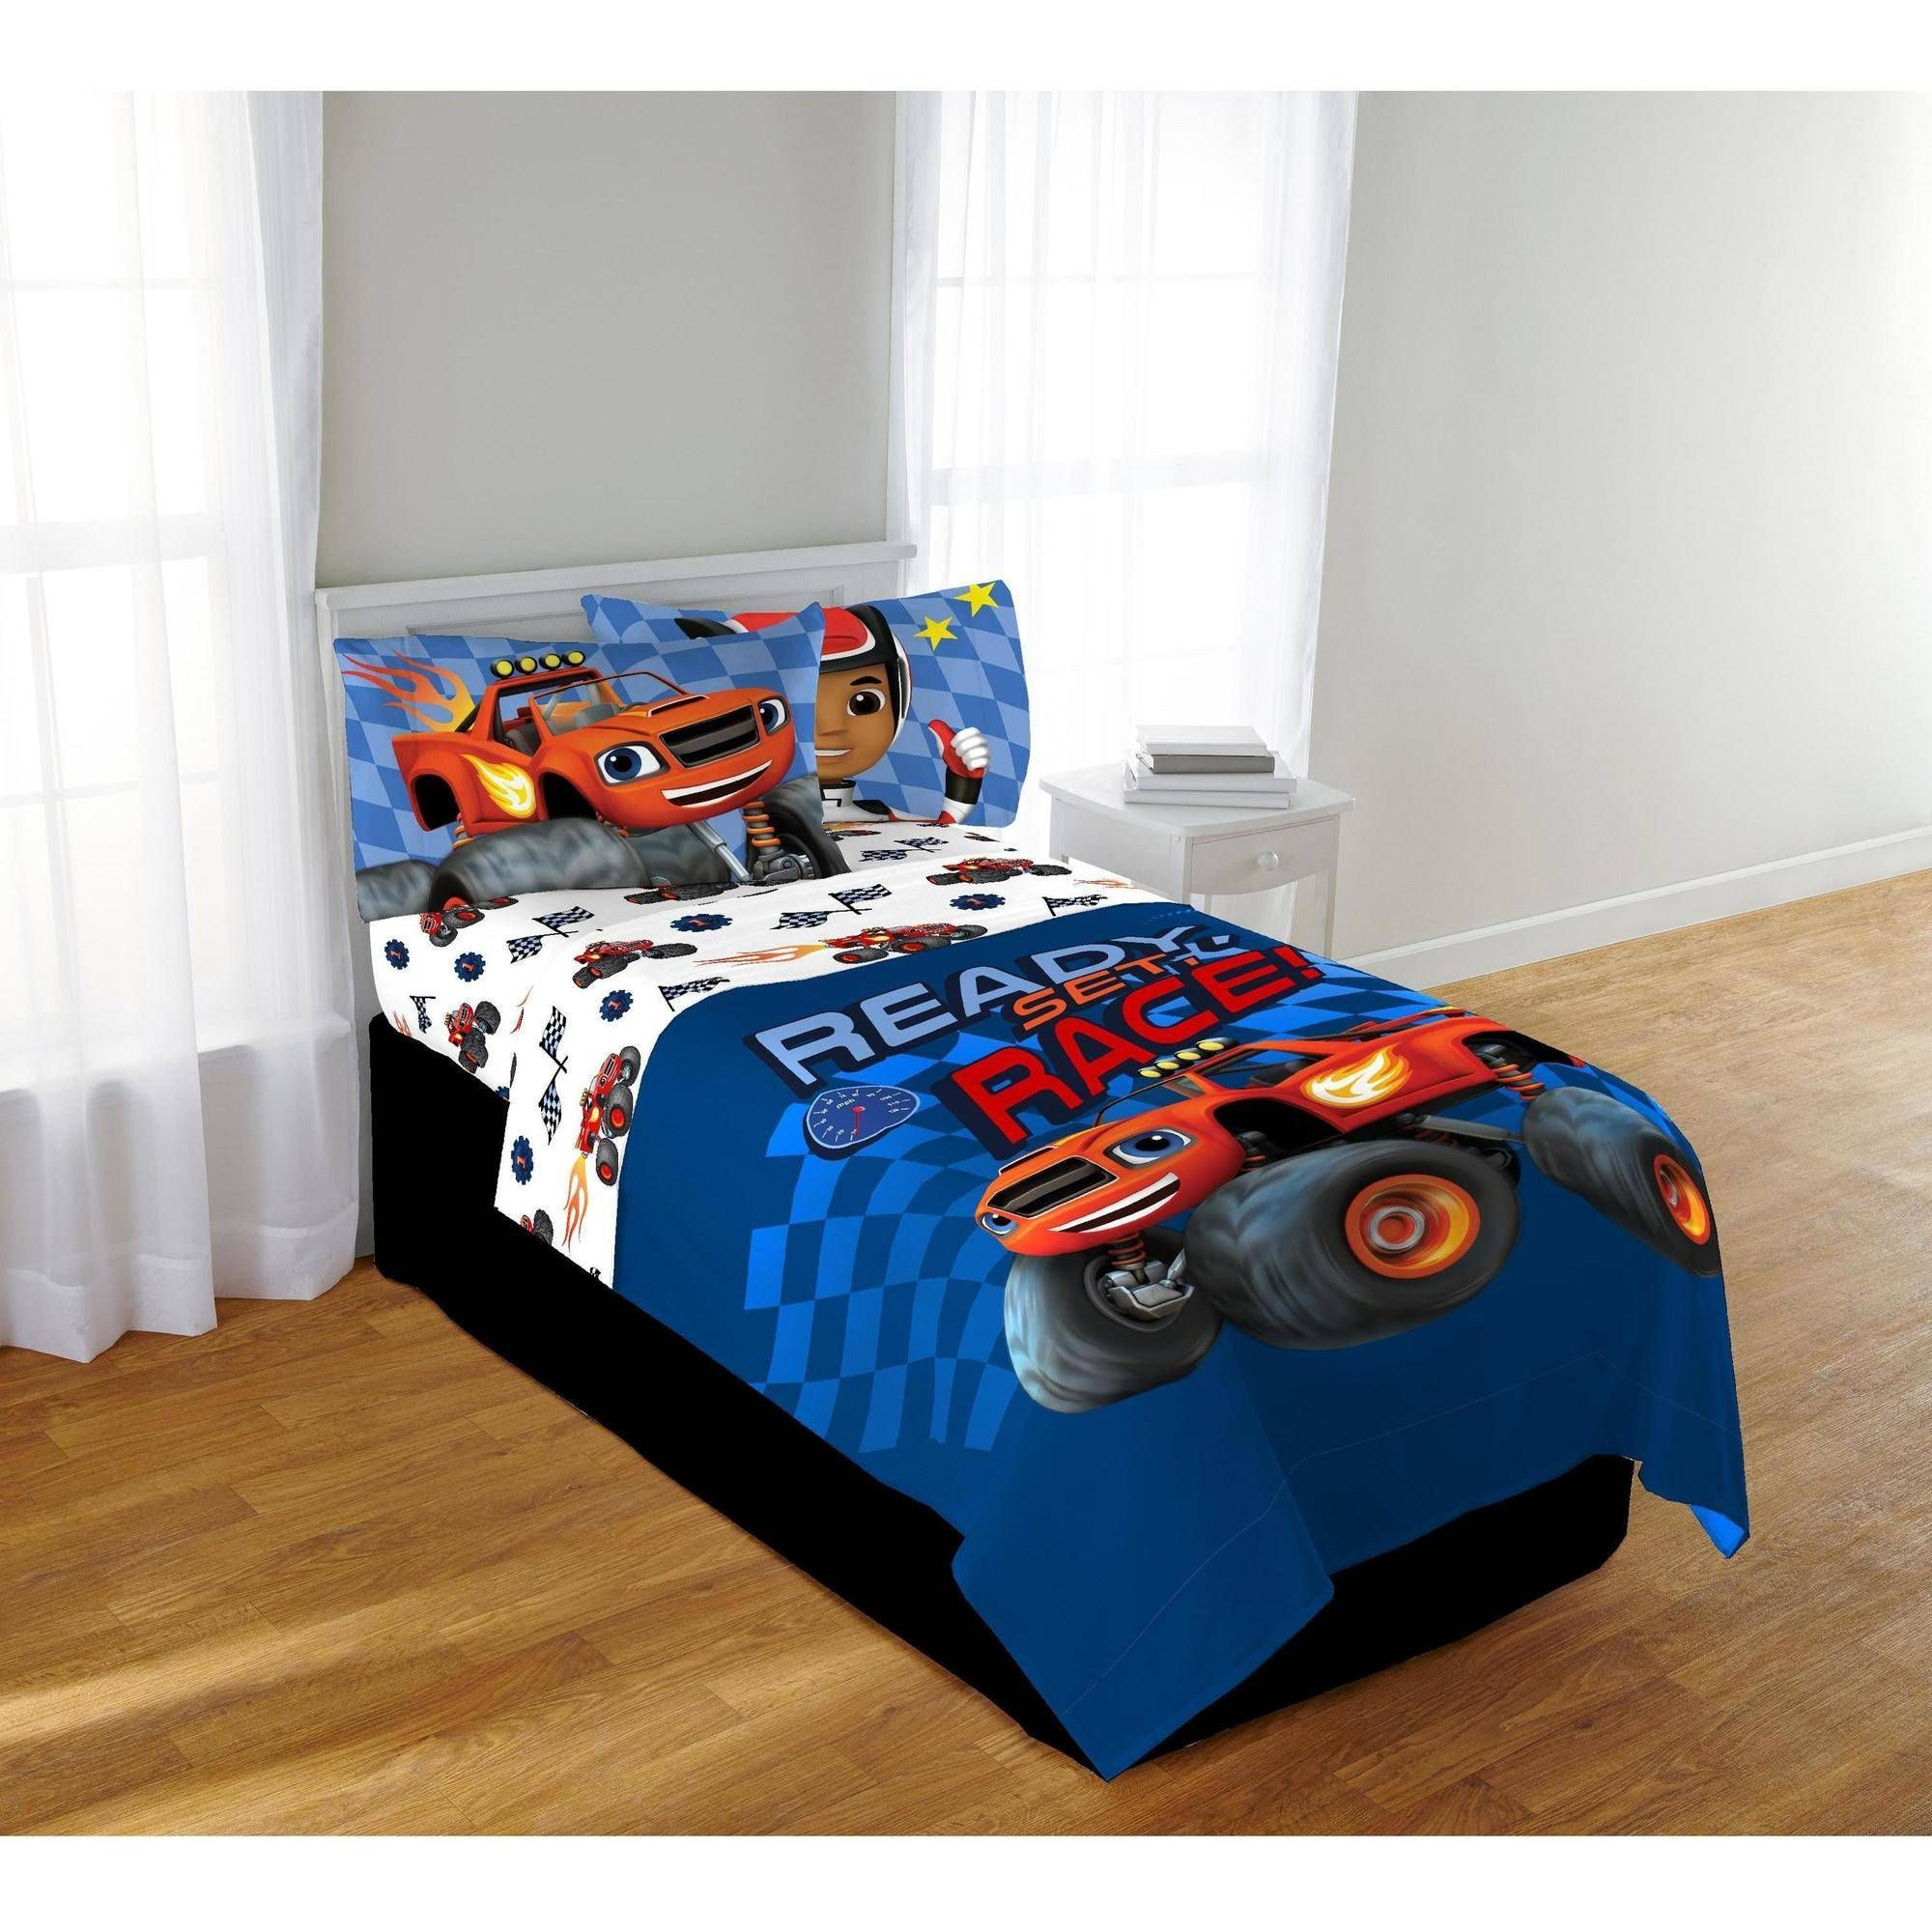 size full comforter unsurpassed in bedding bedroom a mattress set king bed sets